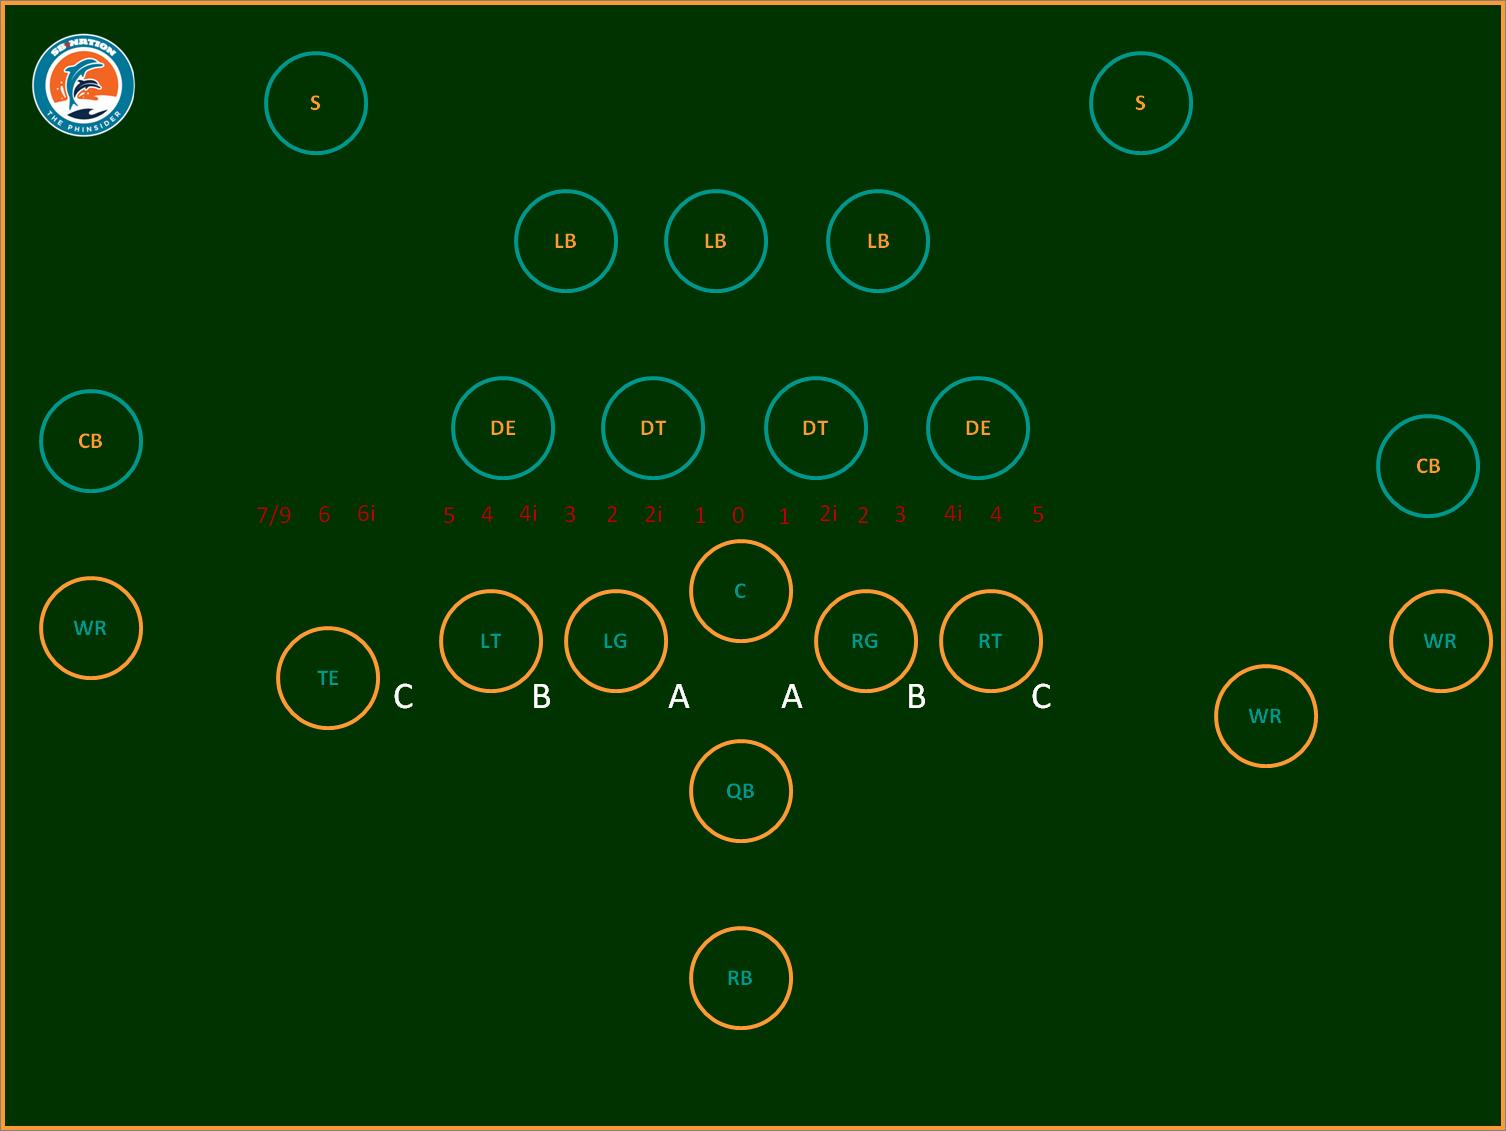 Football play chart template